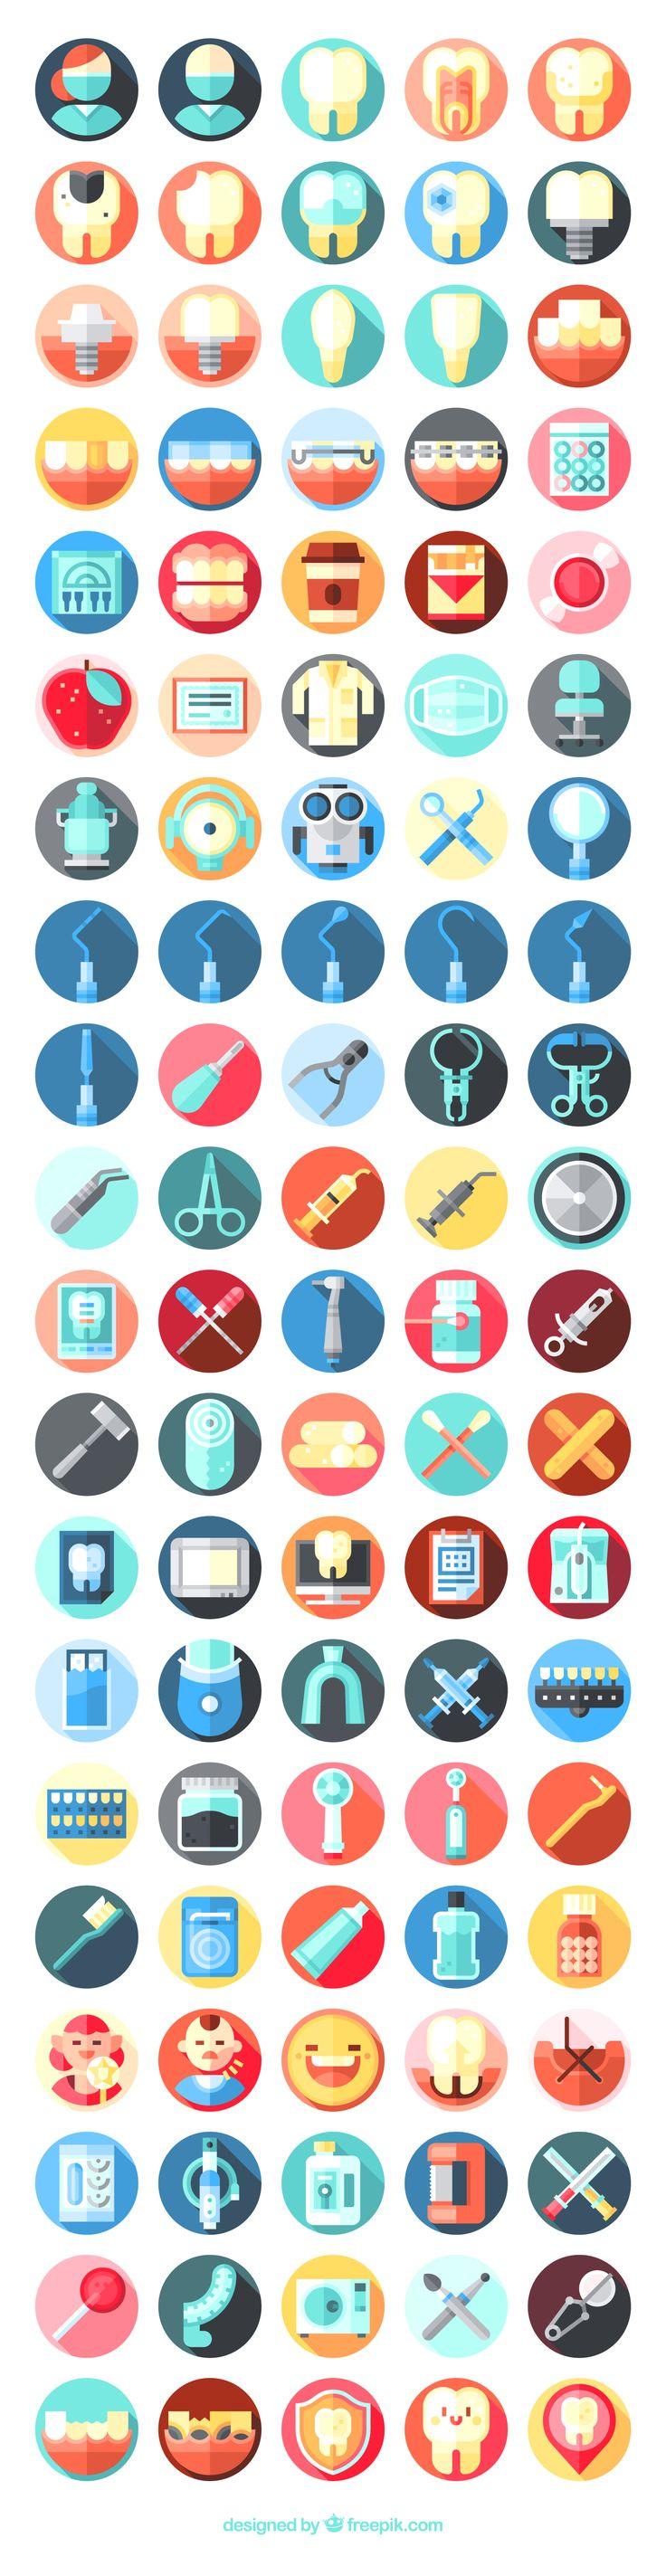 100 Free dental care icons! Flaticon.